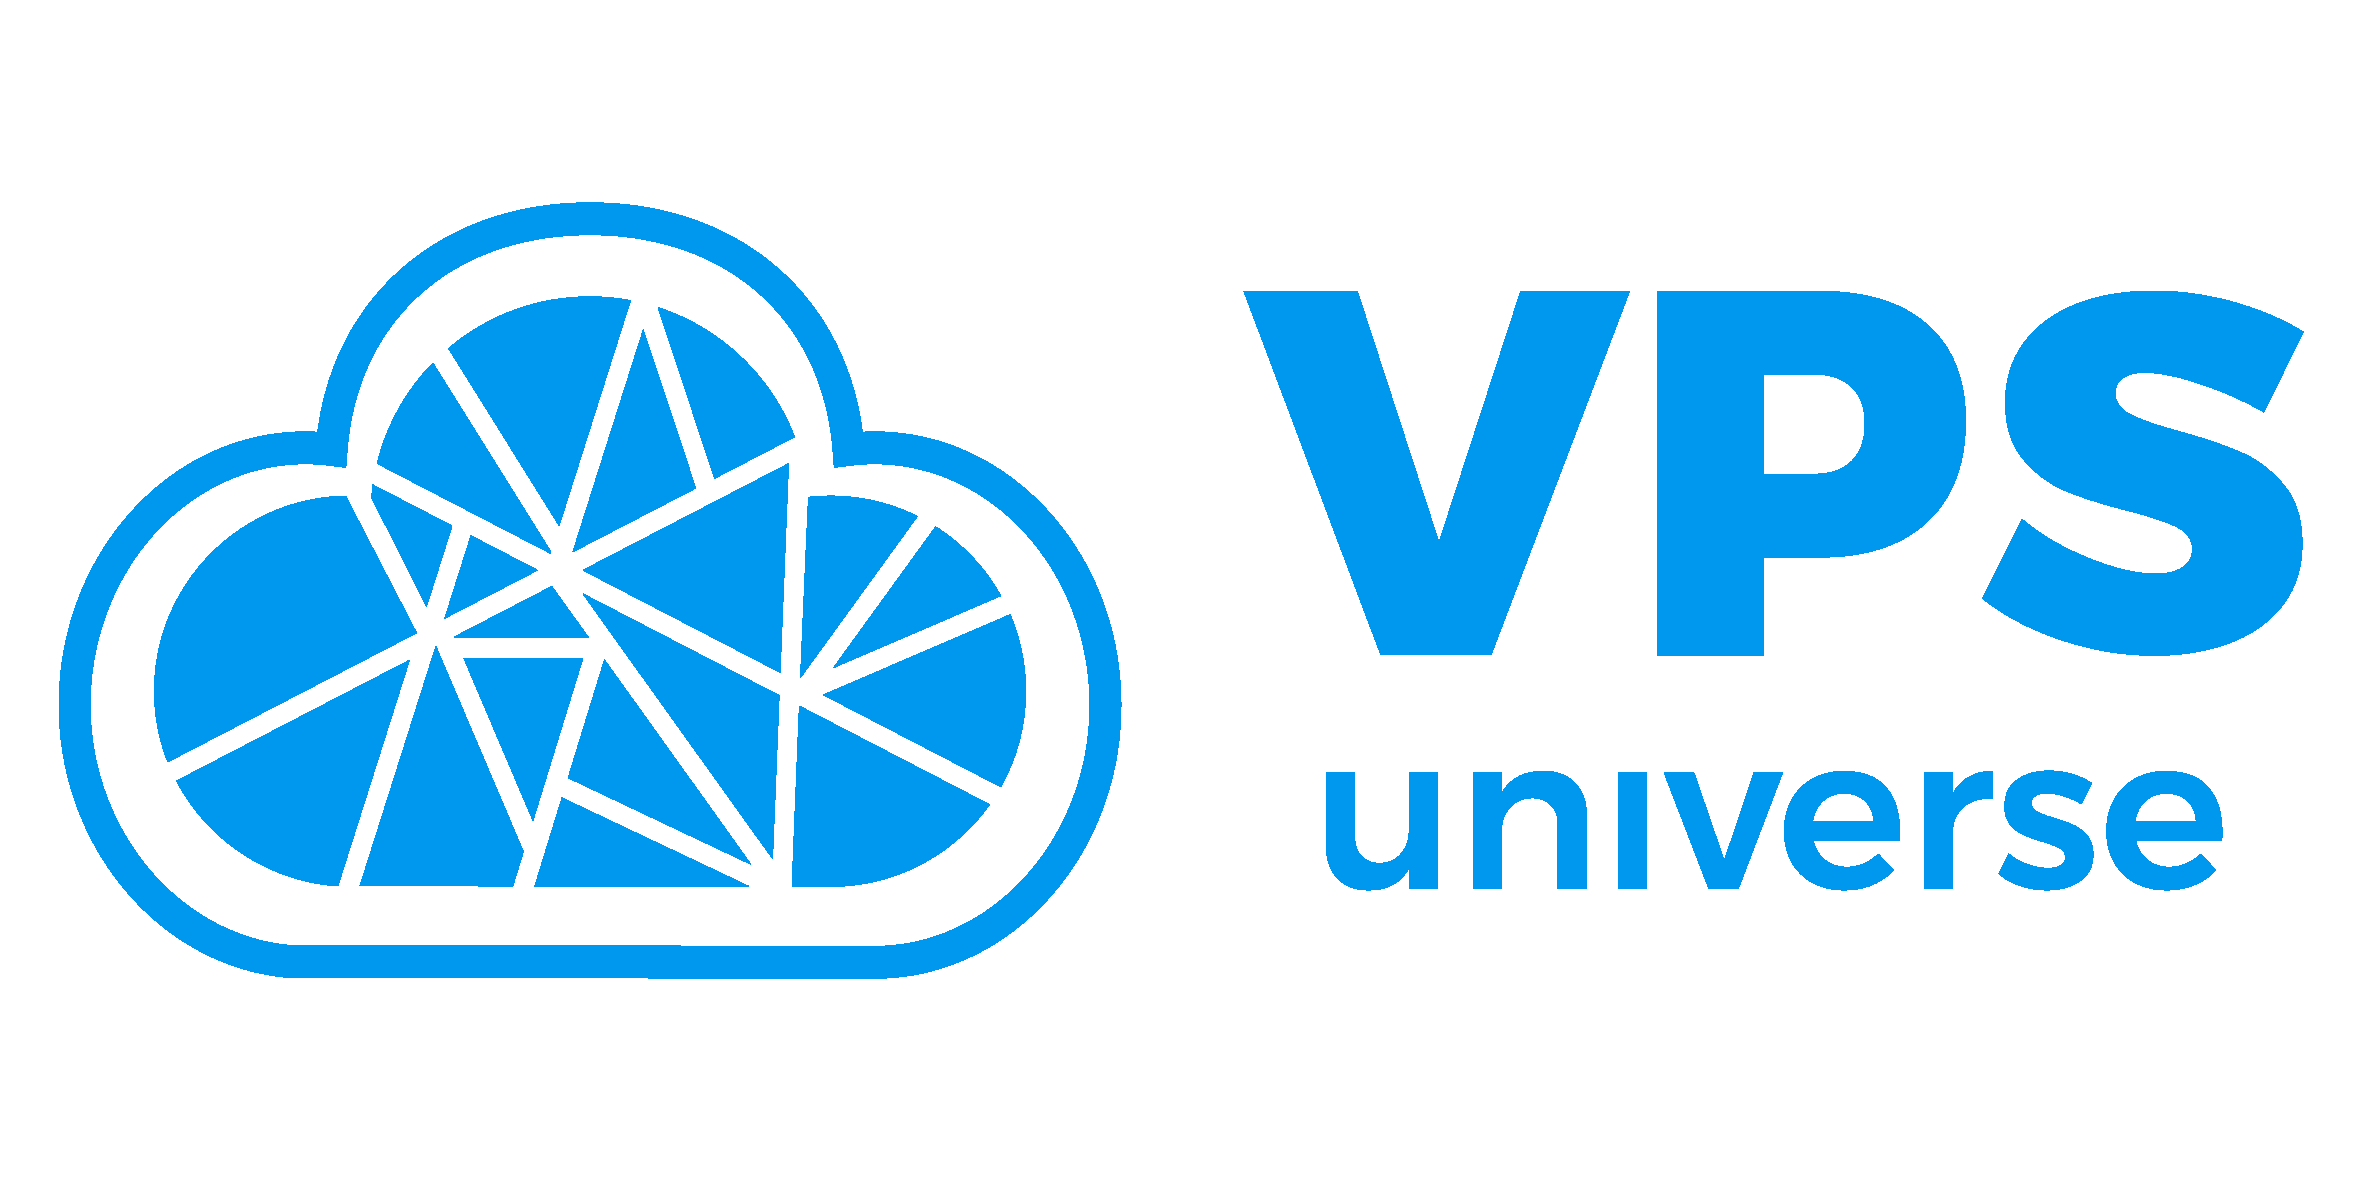 VPS Universe